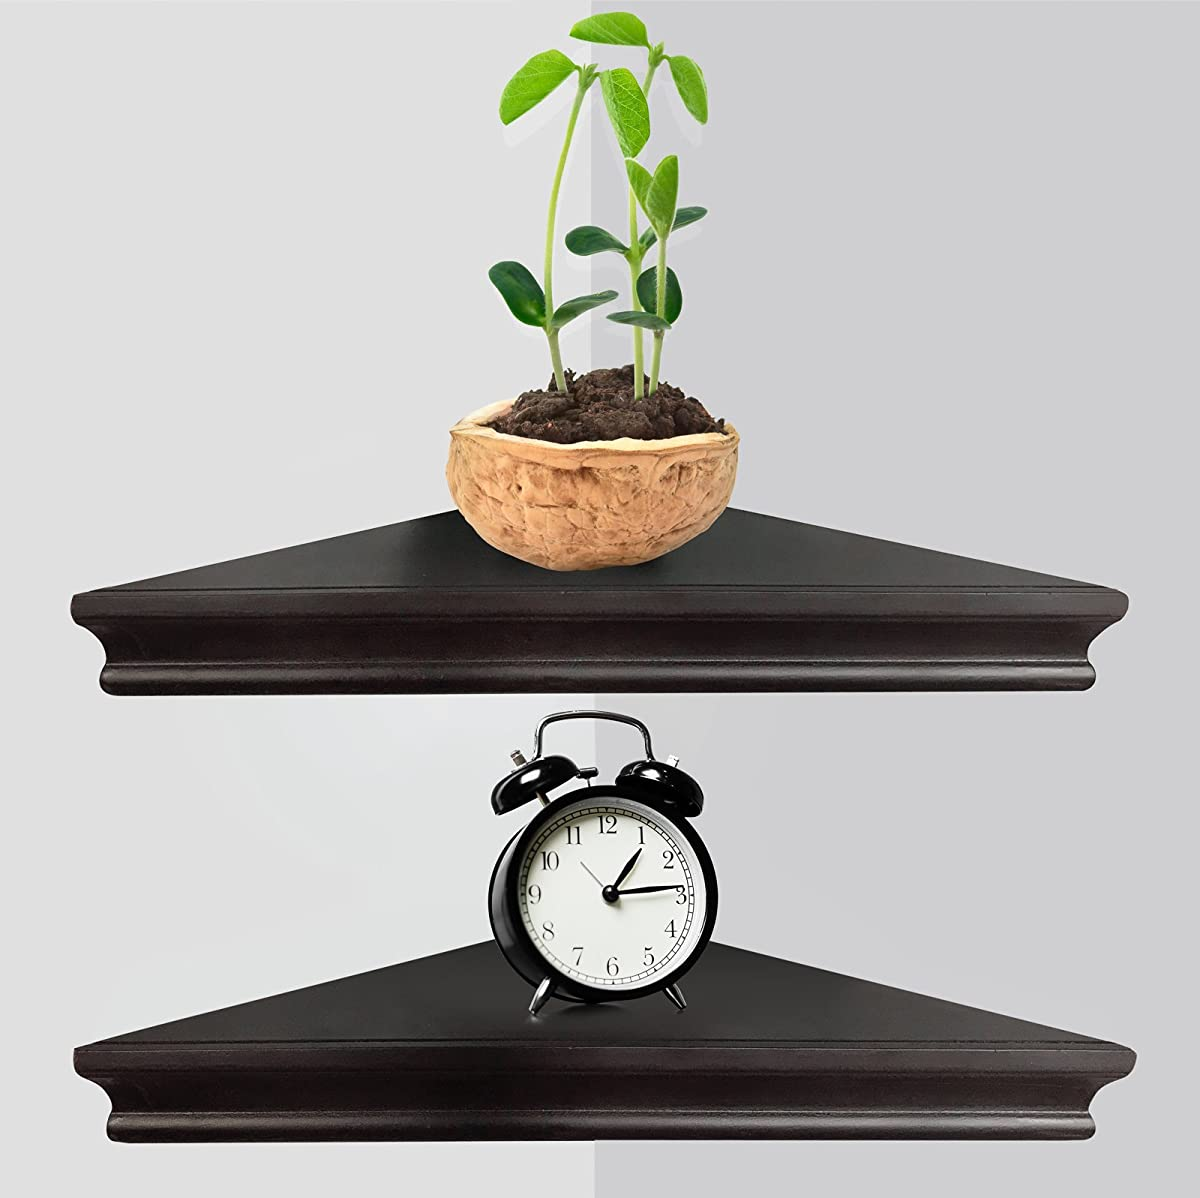 Greenco Set of 2 Corner Floating Shelves with Concealed Hardware- Espresso Finish